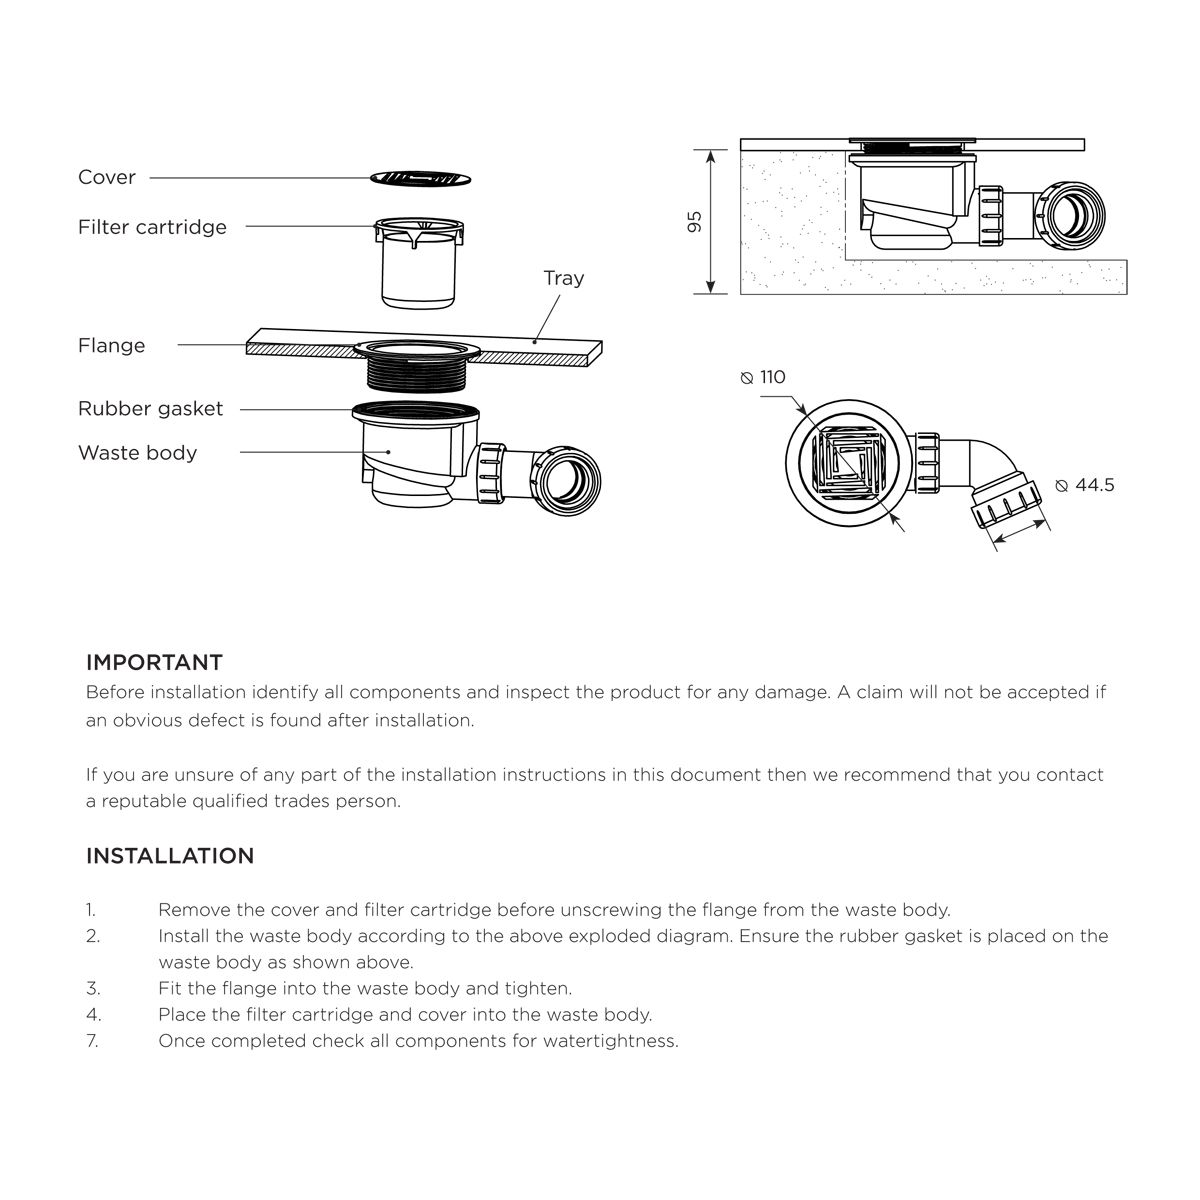 Aquadart 90mm Shower Waste with Black Grate Instructions